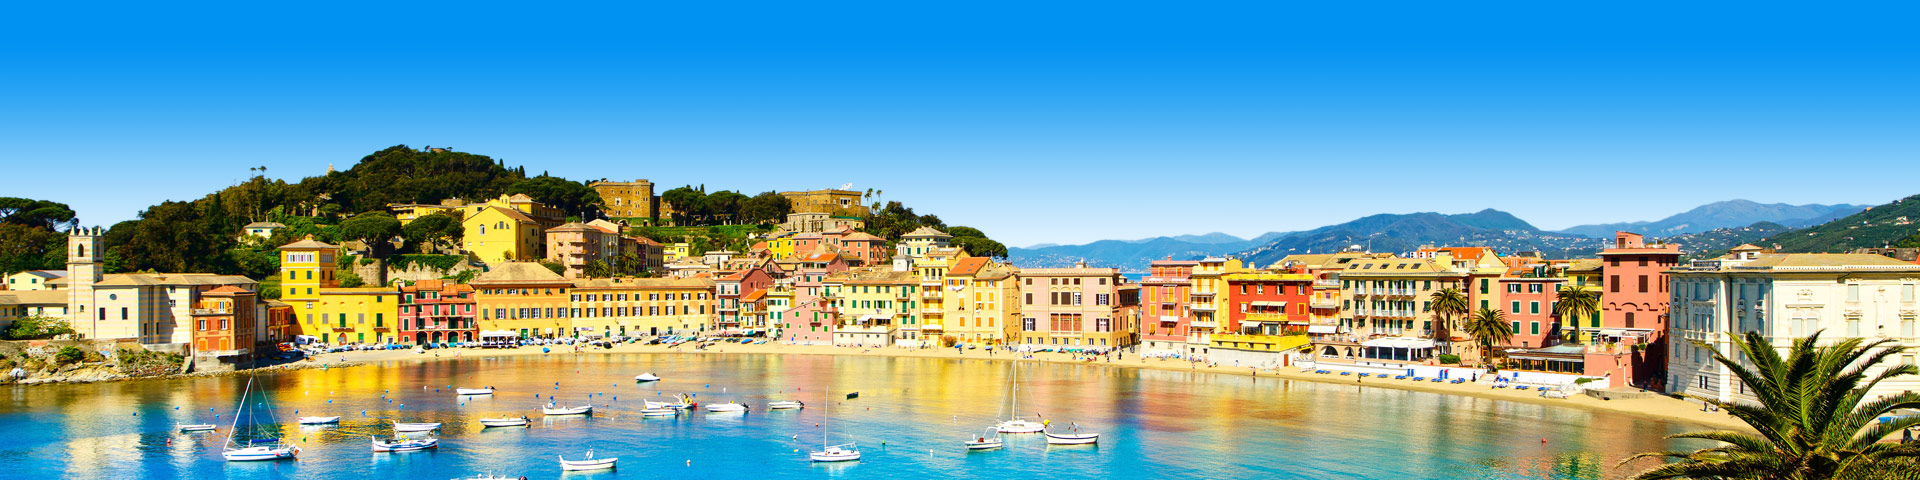 Zomervakantie Italië